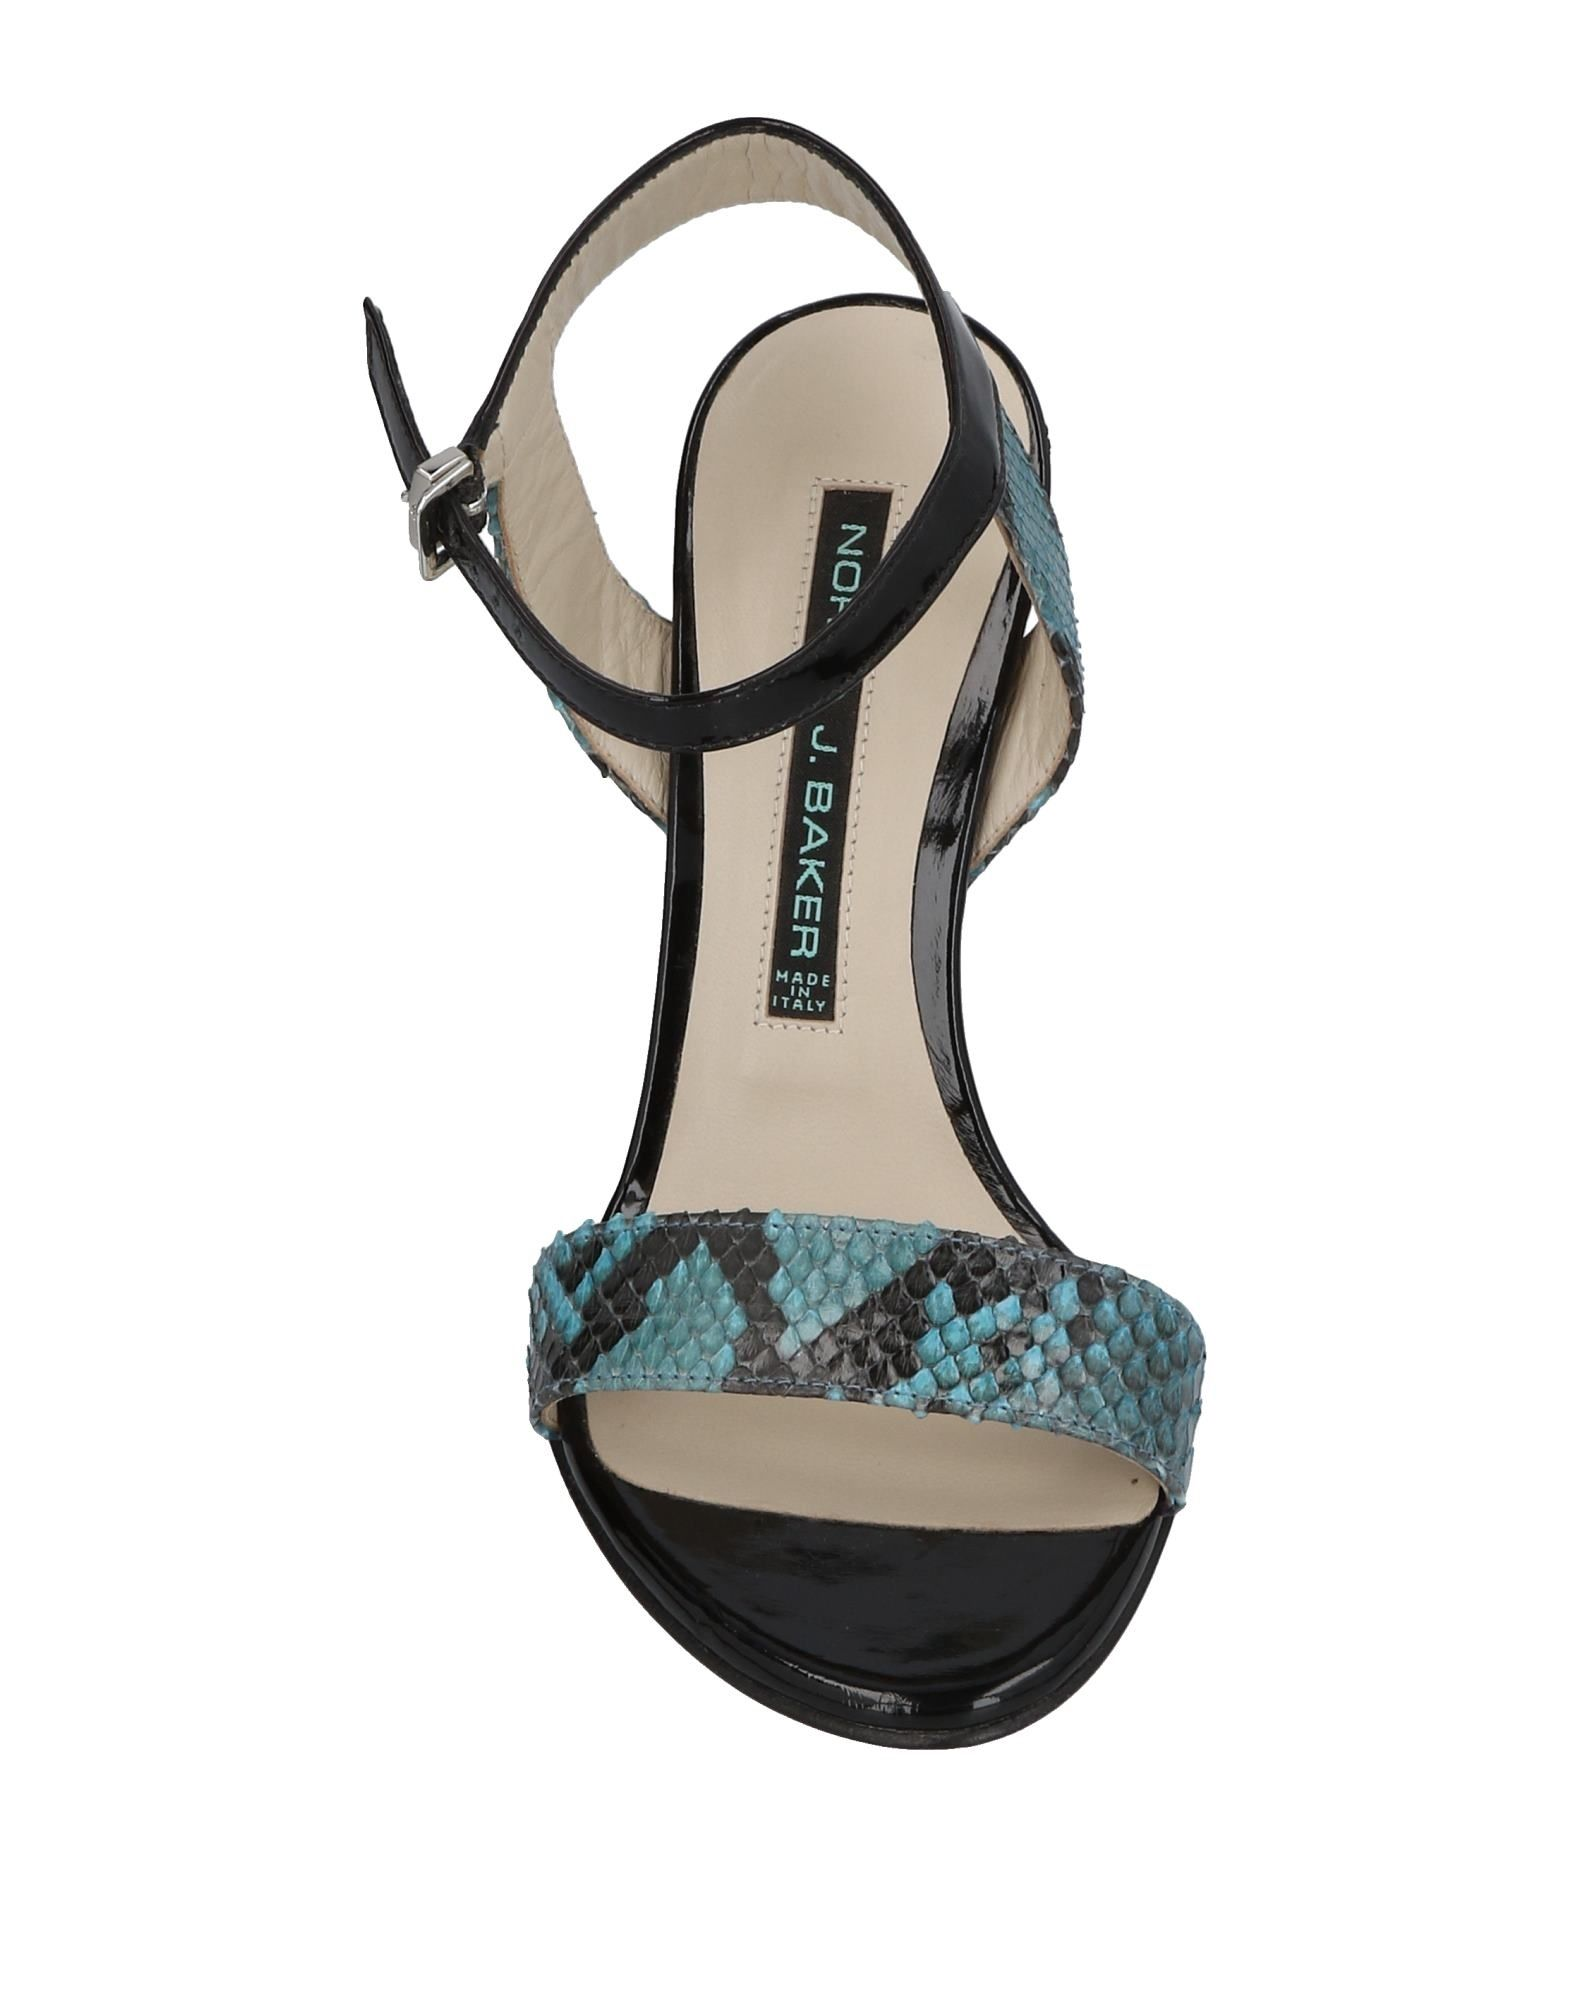 Norma J.Baker Sandals - Women Women Women Norma J.Baker Sandals online on  United Kingdom - 11461042RR 2c53b0